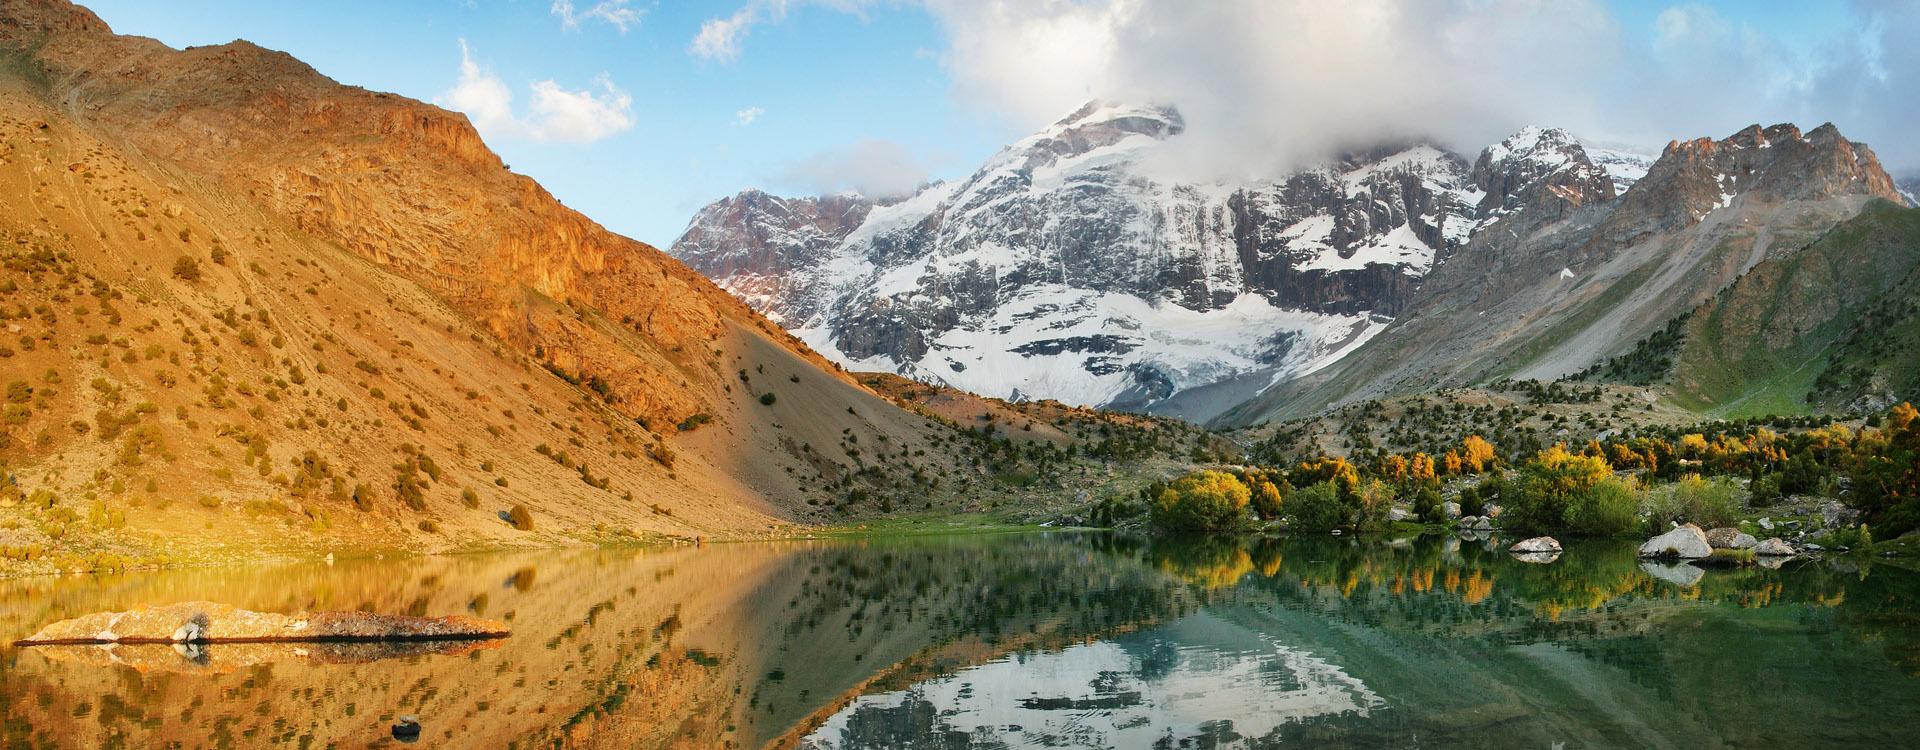 Lake in the Fan Mountains, Tajikistan